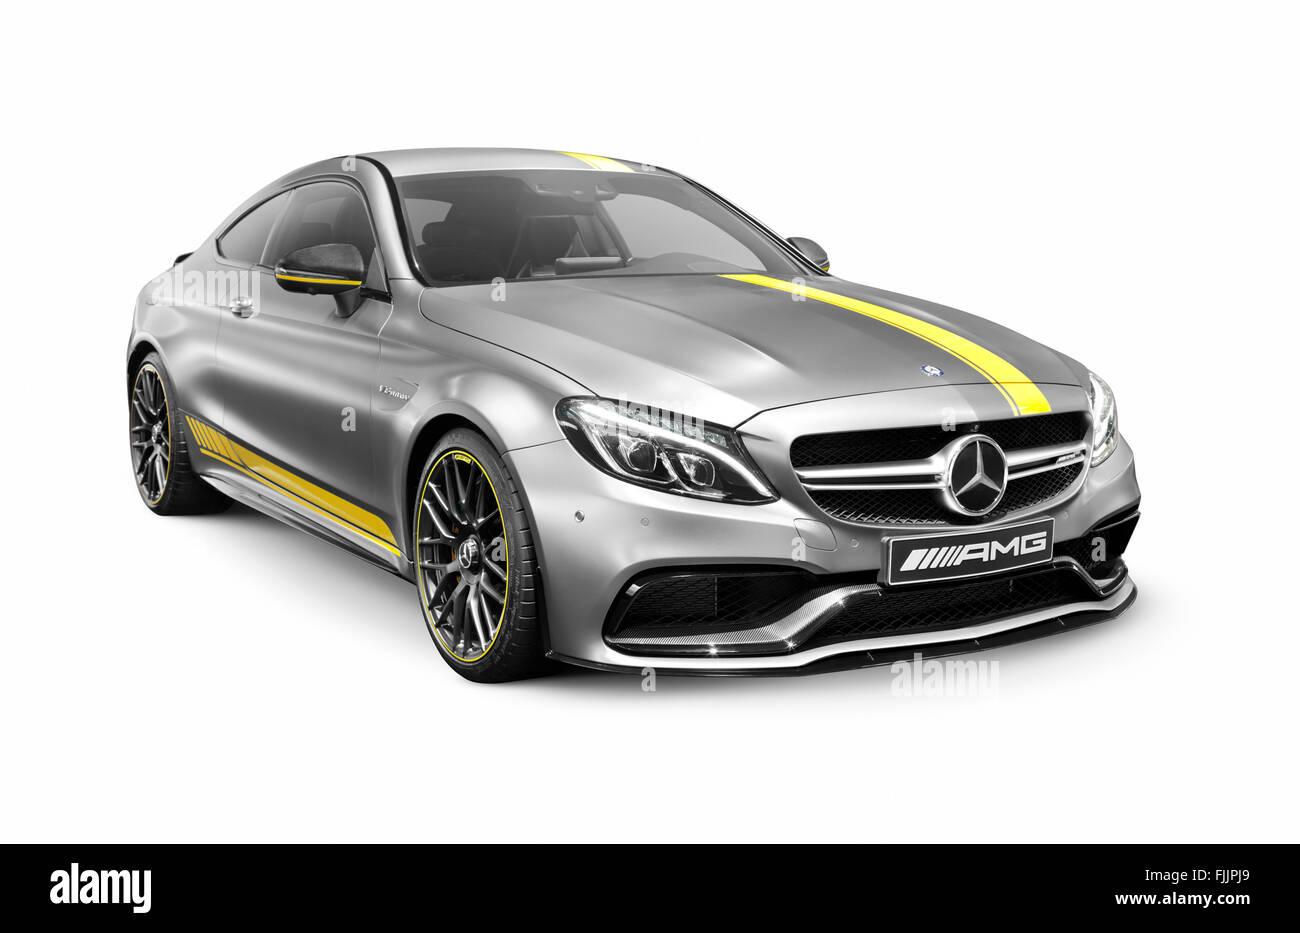 Pics For > Mercedes Benz Sport Car White